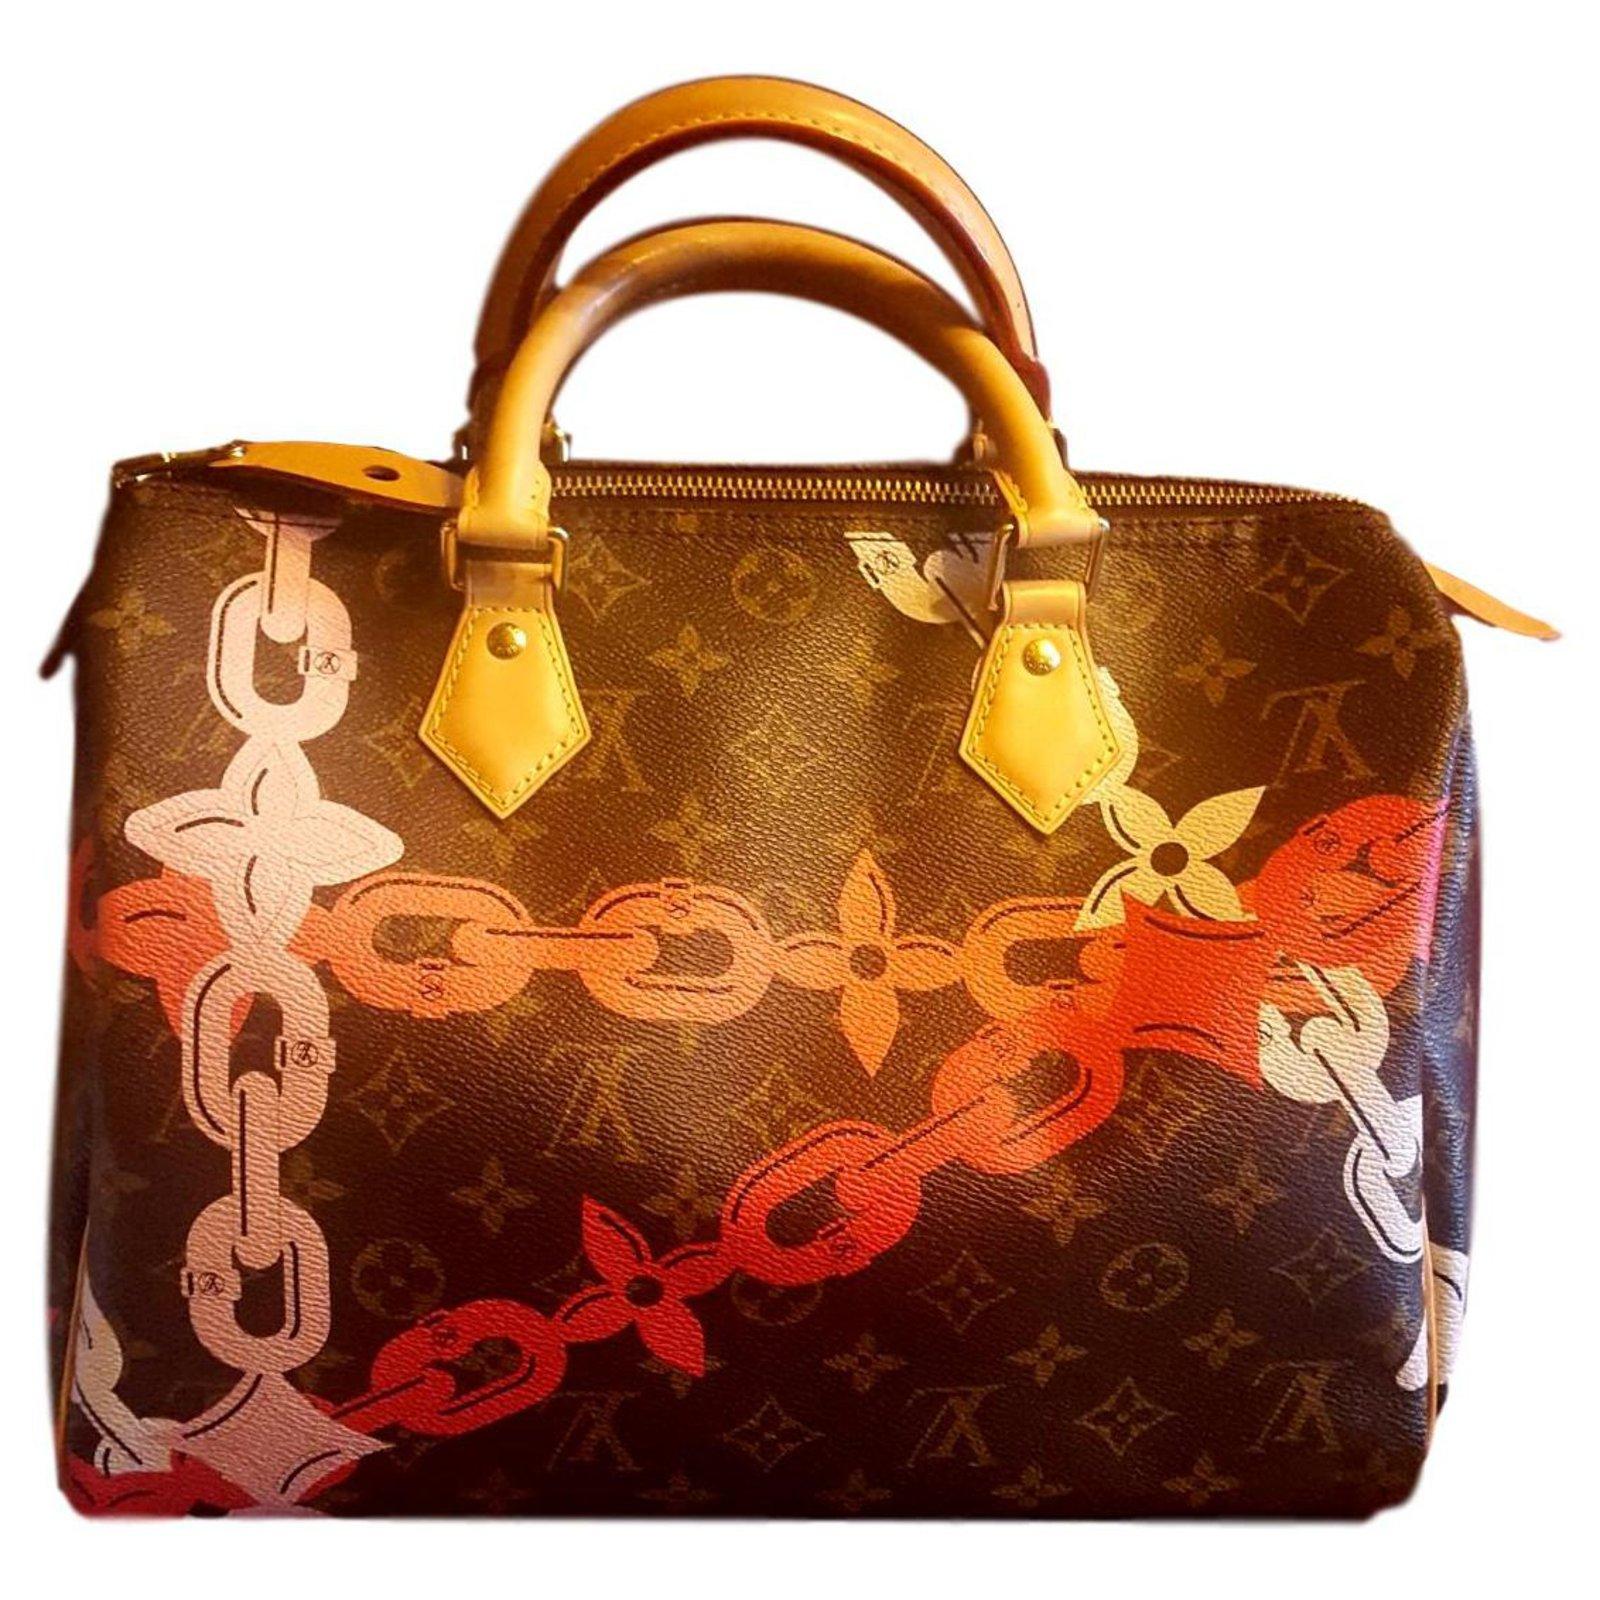 b4210b6cdd9 Louis Vuitton Handbags Under 1000